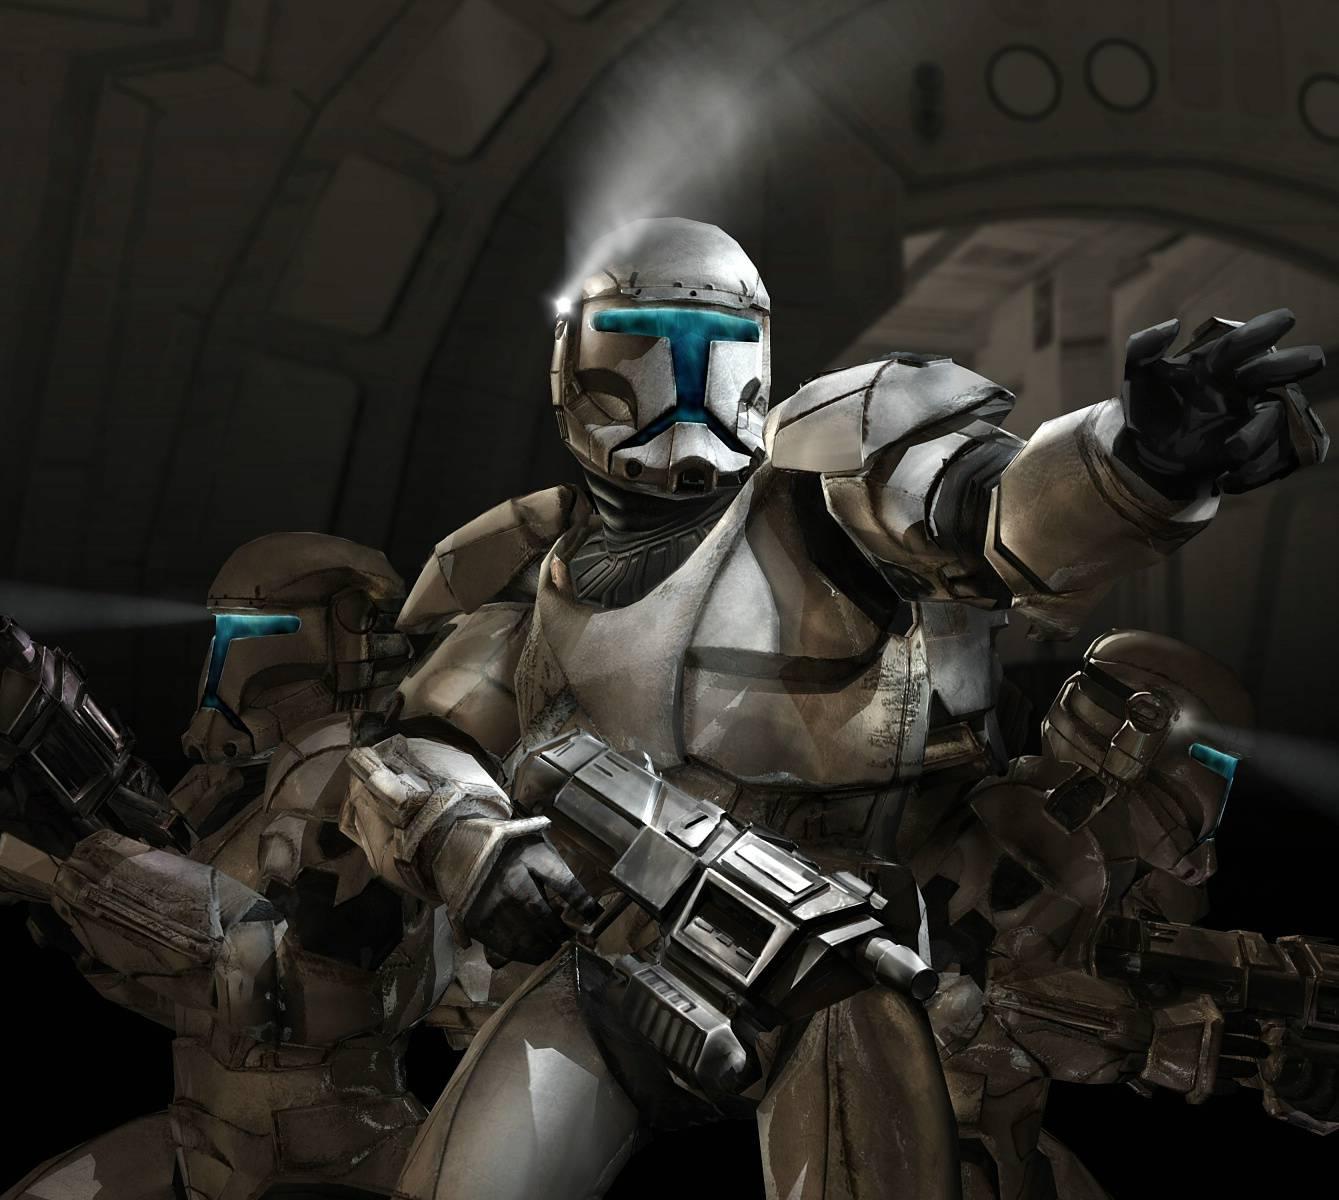 Stars Wars Rp